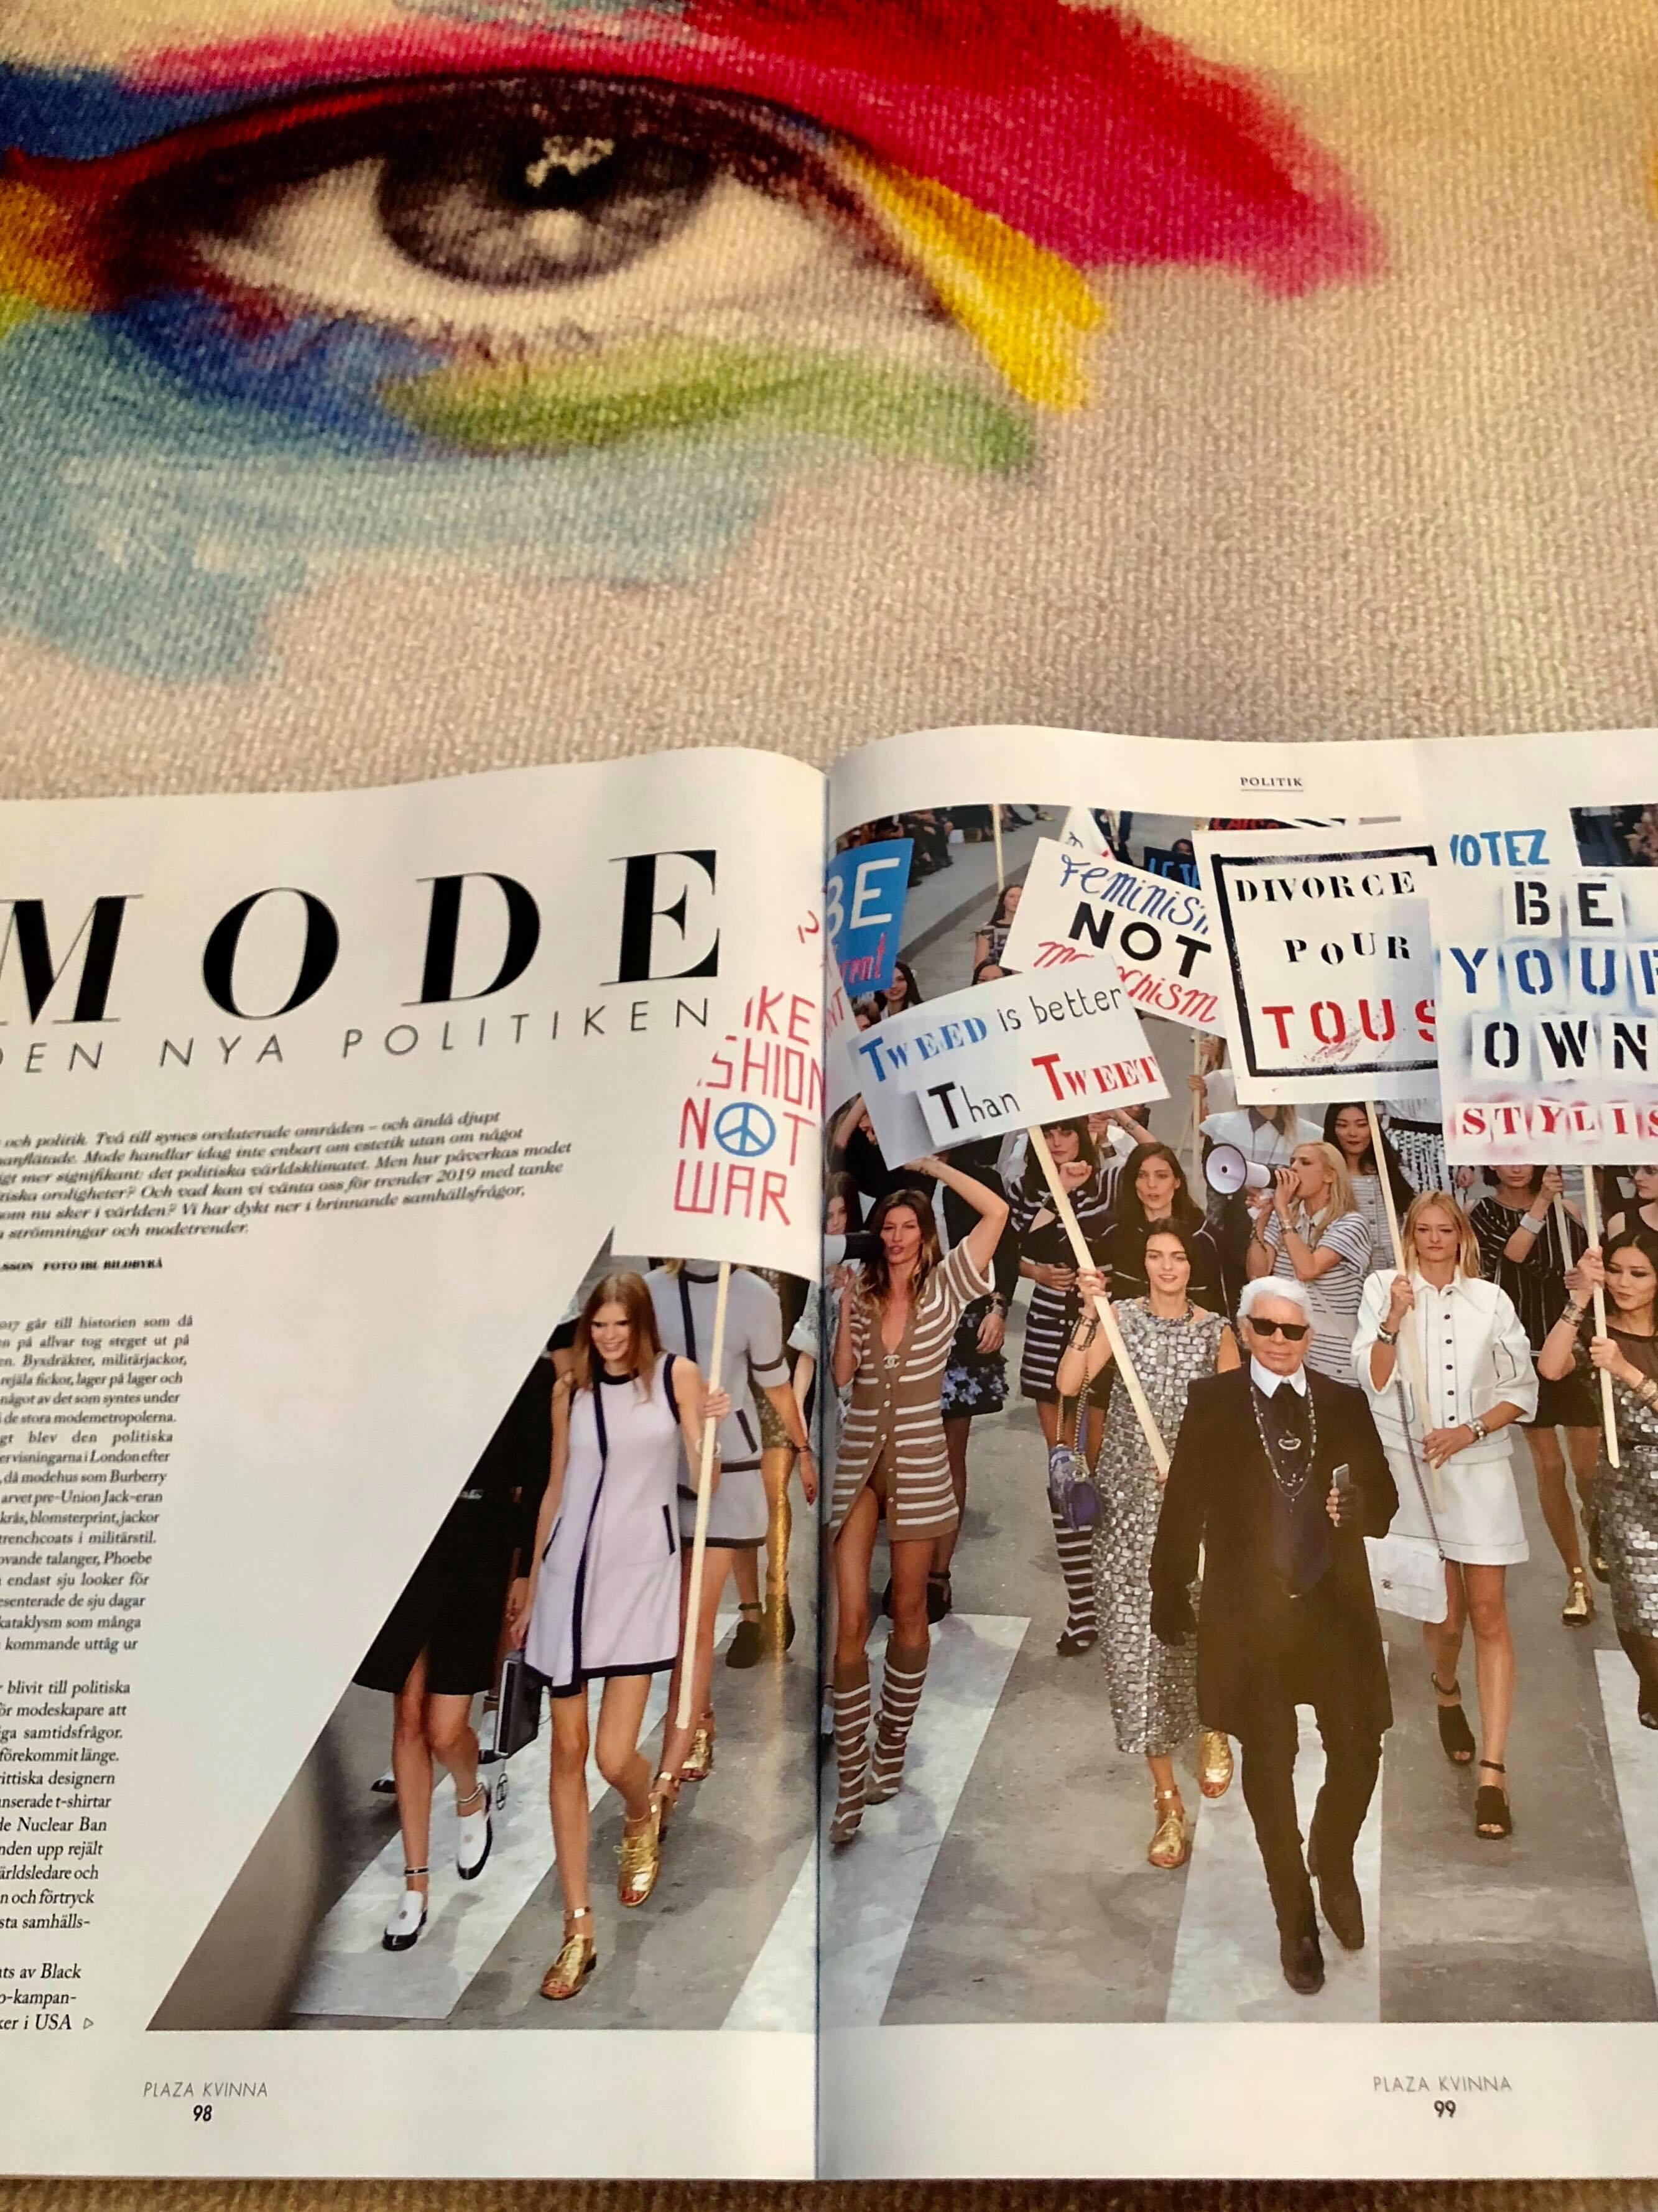 Mode den nya politiken